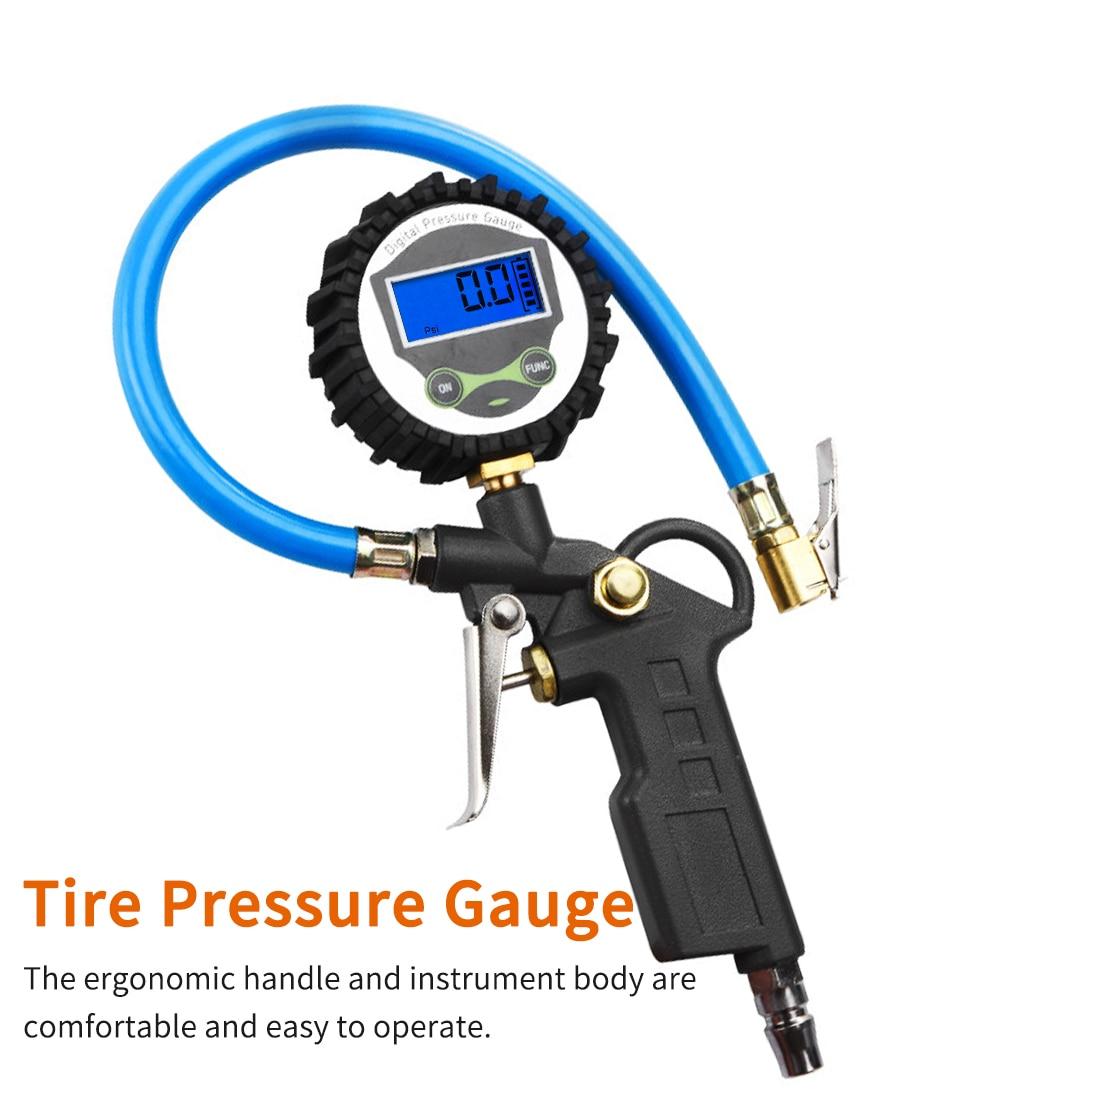 0-220 PSI 0-16Bar Tire Pressure Monitor Pressure Gauge Automobile Car Truck Air Tire Inflator With Gauge Dial Meter Tester